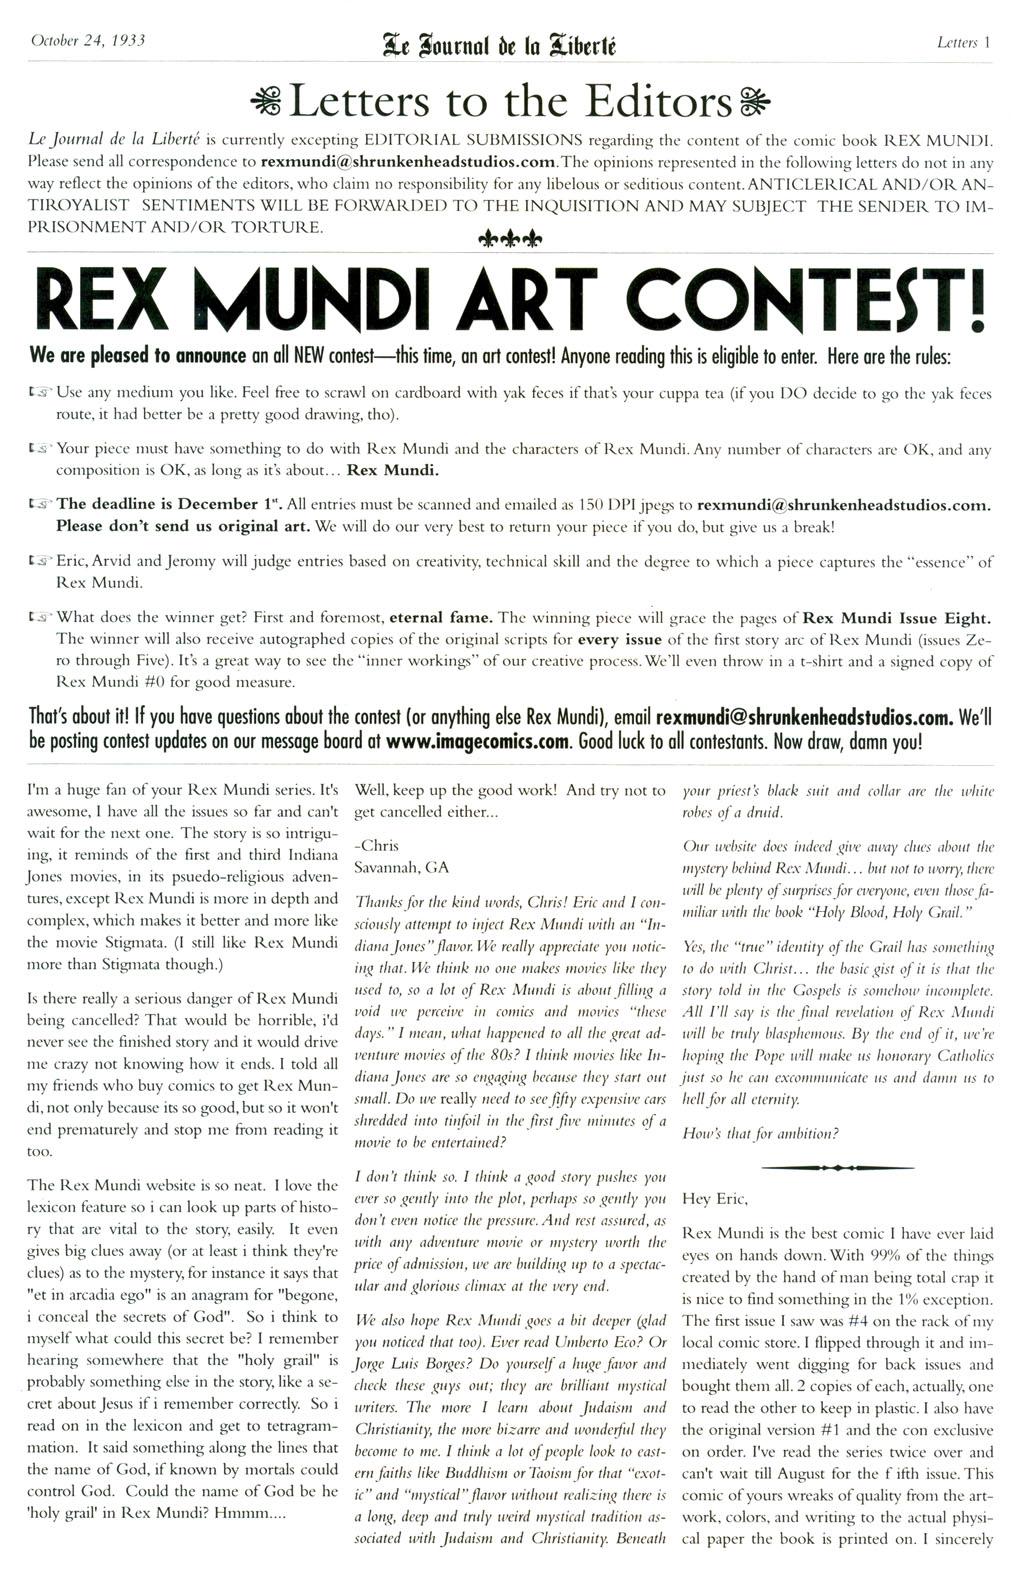 Read online Rex Mundi comic -  Issue #6 - 29